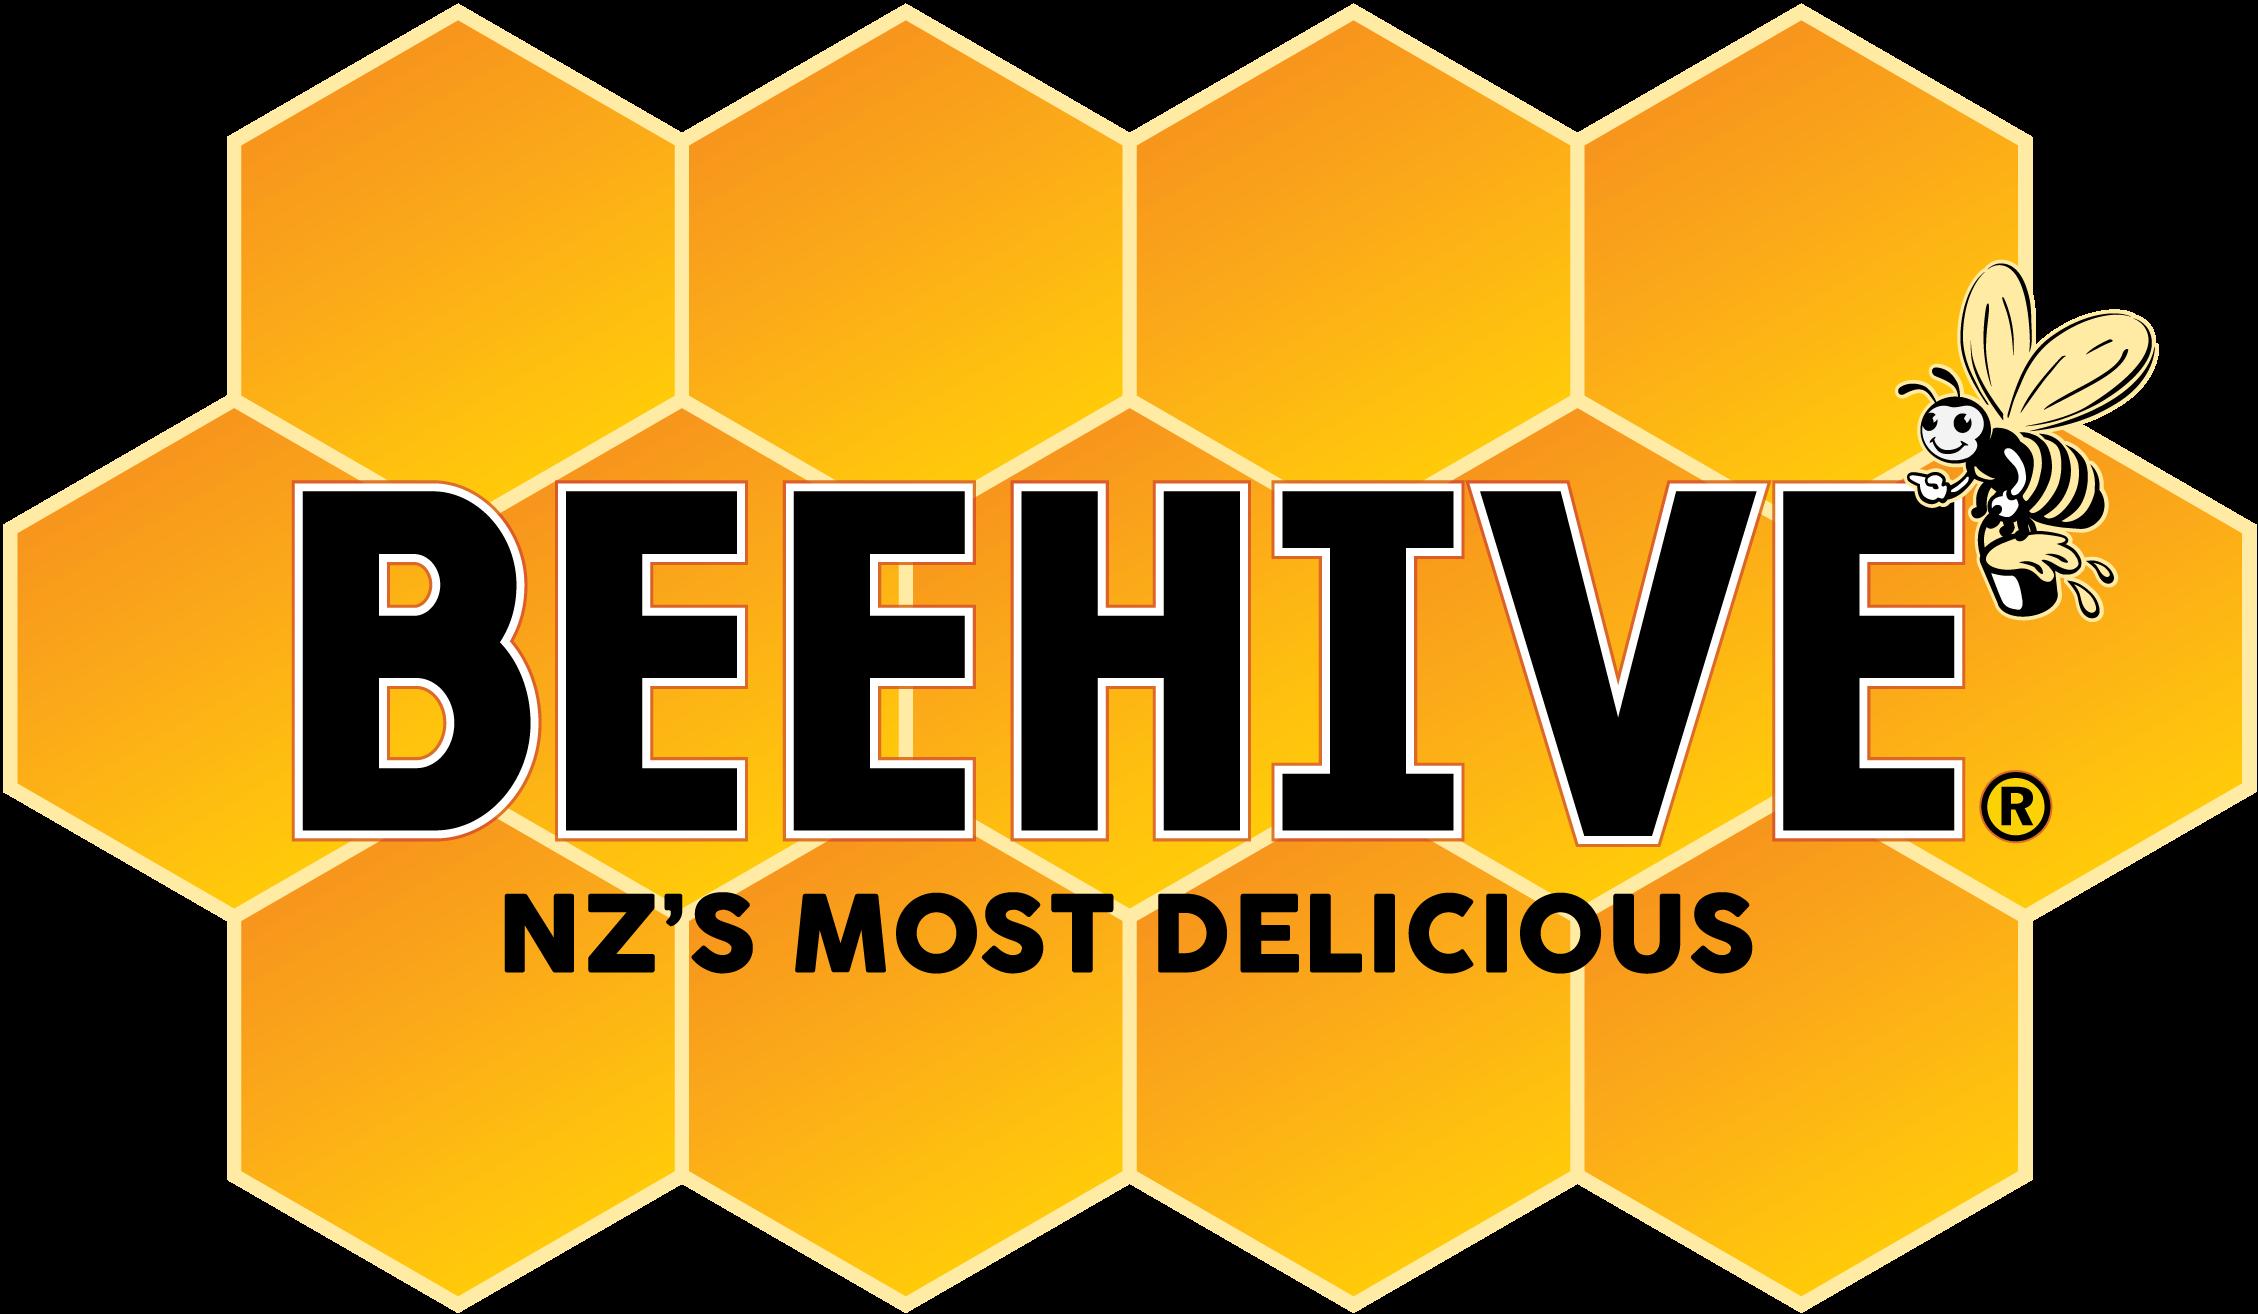 Beehive-honeycomb-logo.png